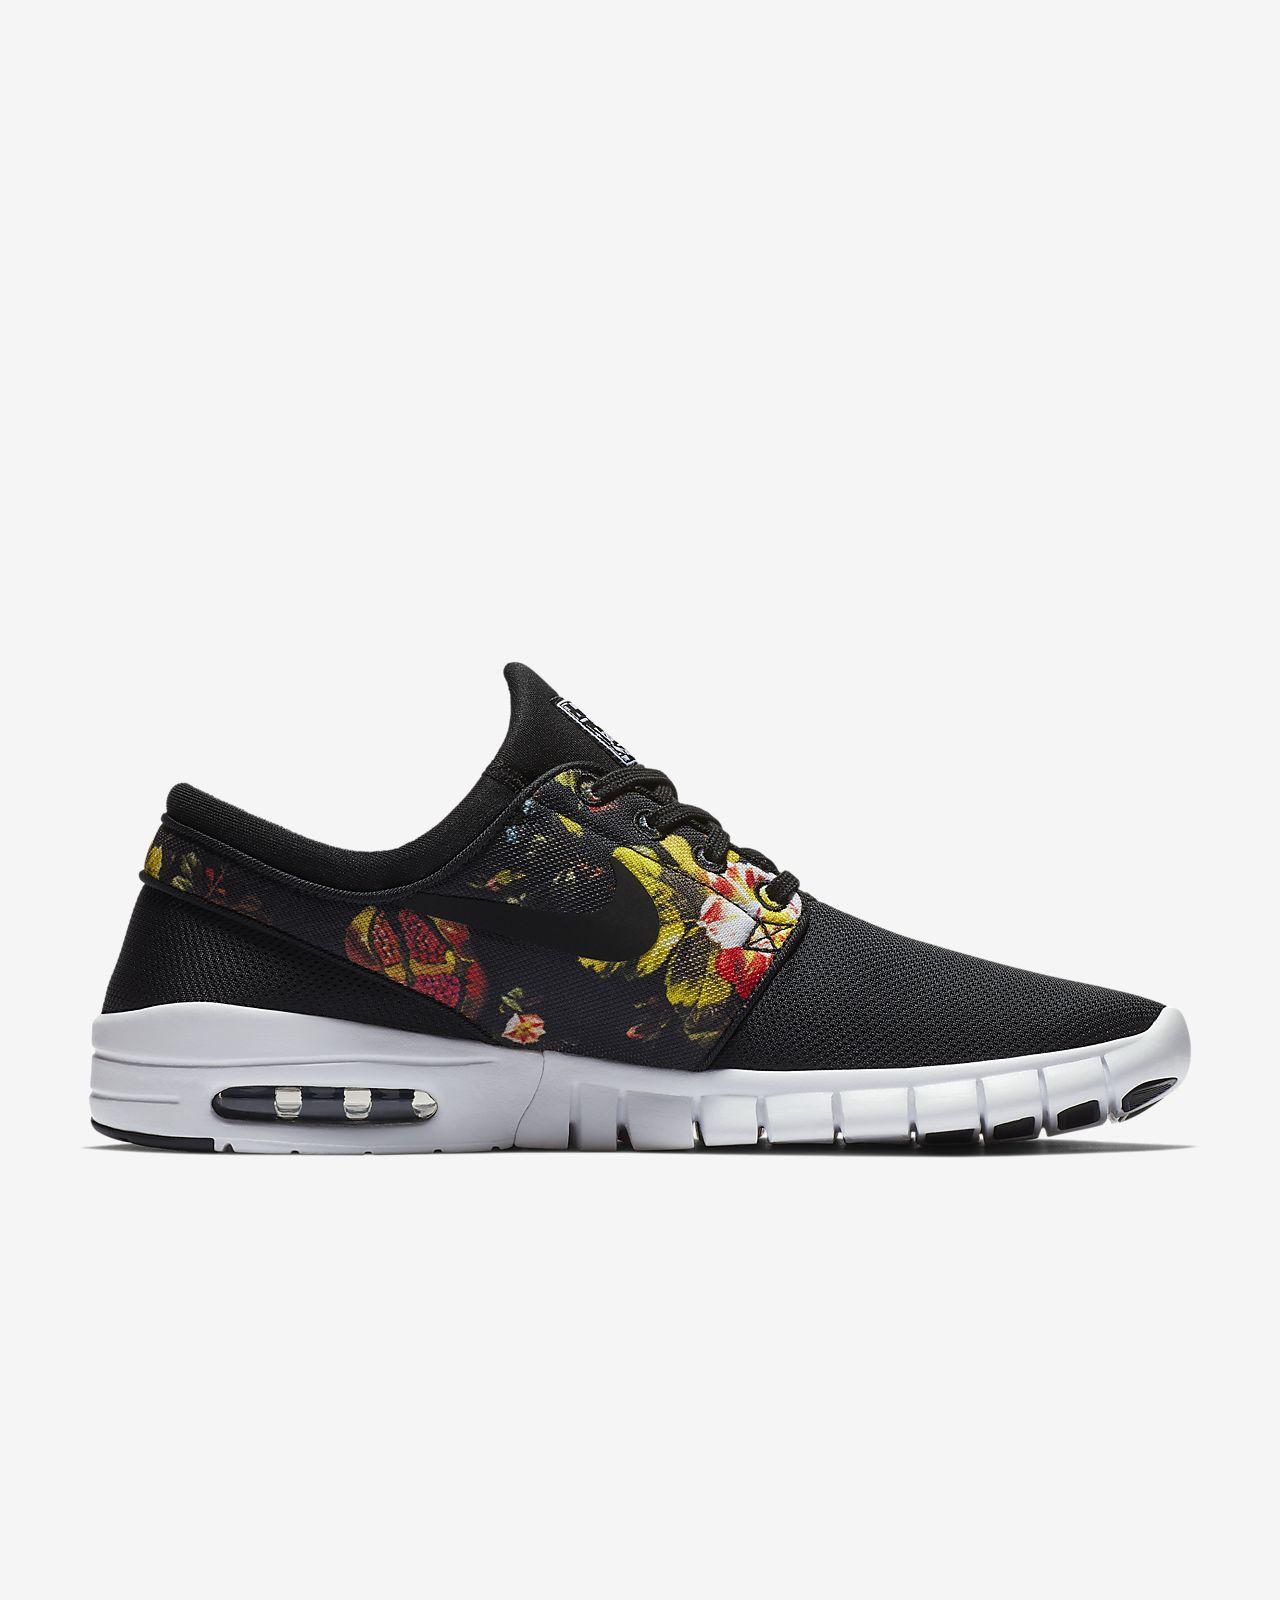 d3a36f3f09a Nike SB Stefan Janoski Max Skate Shoe. Nike.com